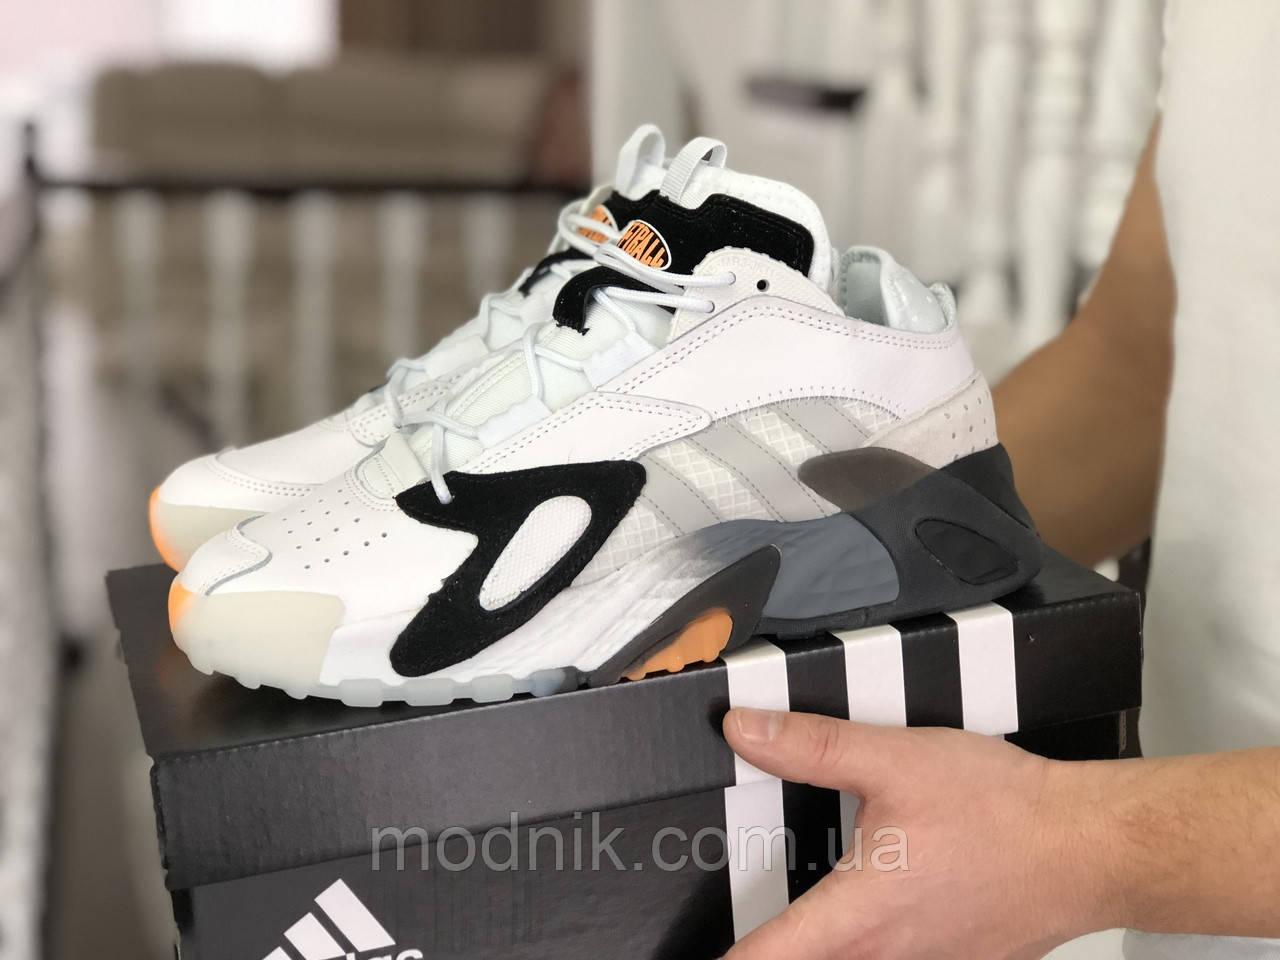 Мужские кроссовки Adidas Streetball (белые)